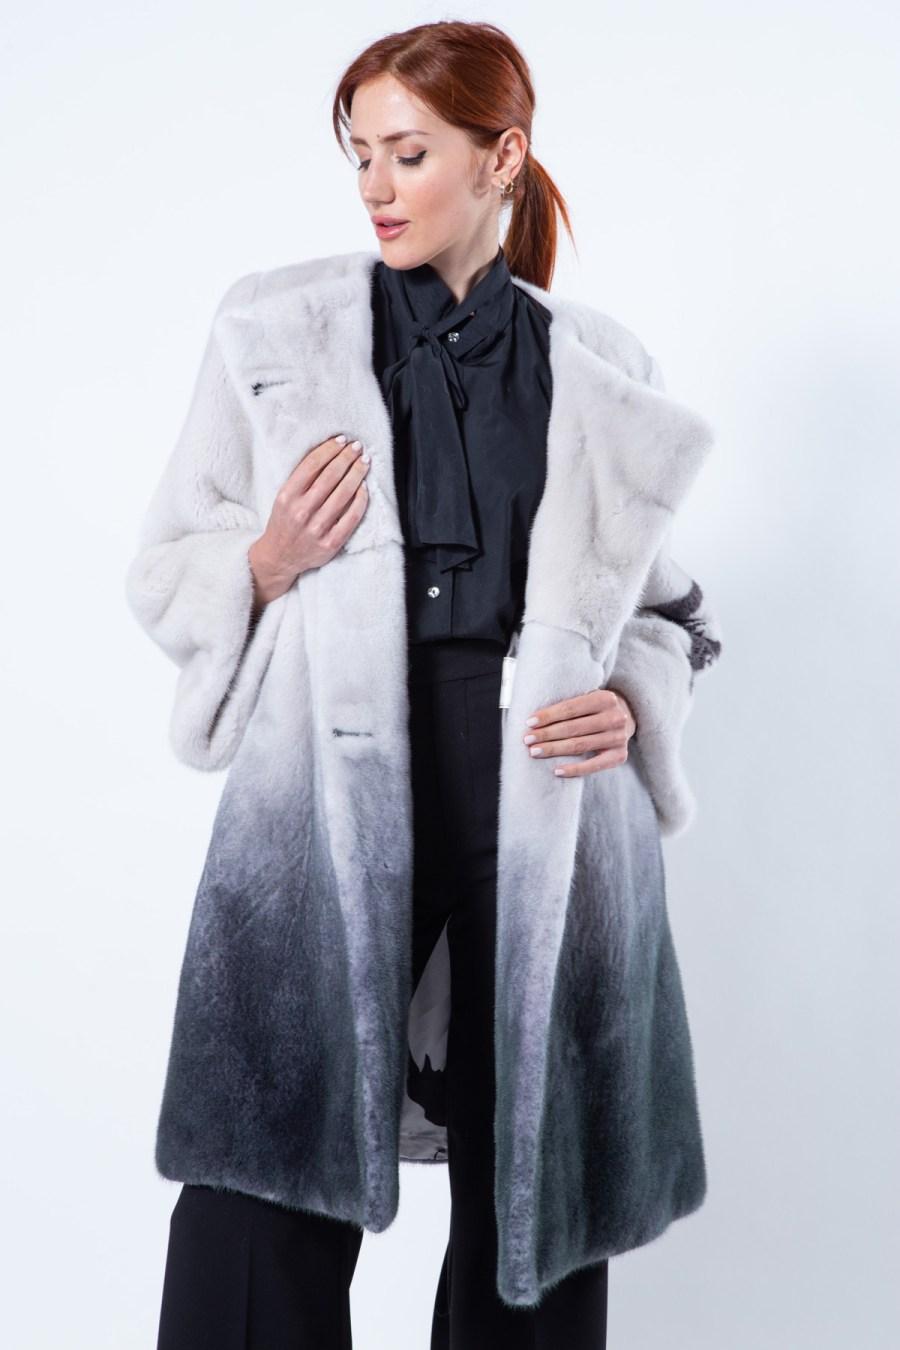 Black Degrade Mink Jacket with 7/8 Sleeves | Sarigianni Furs